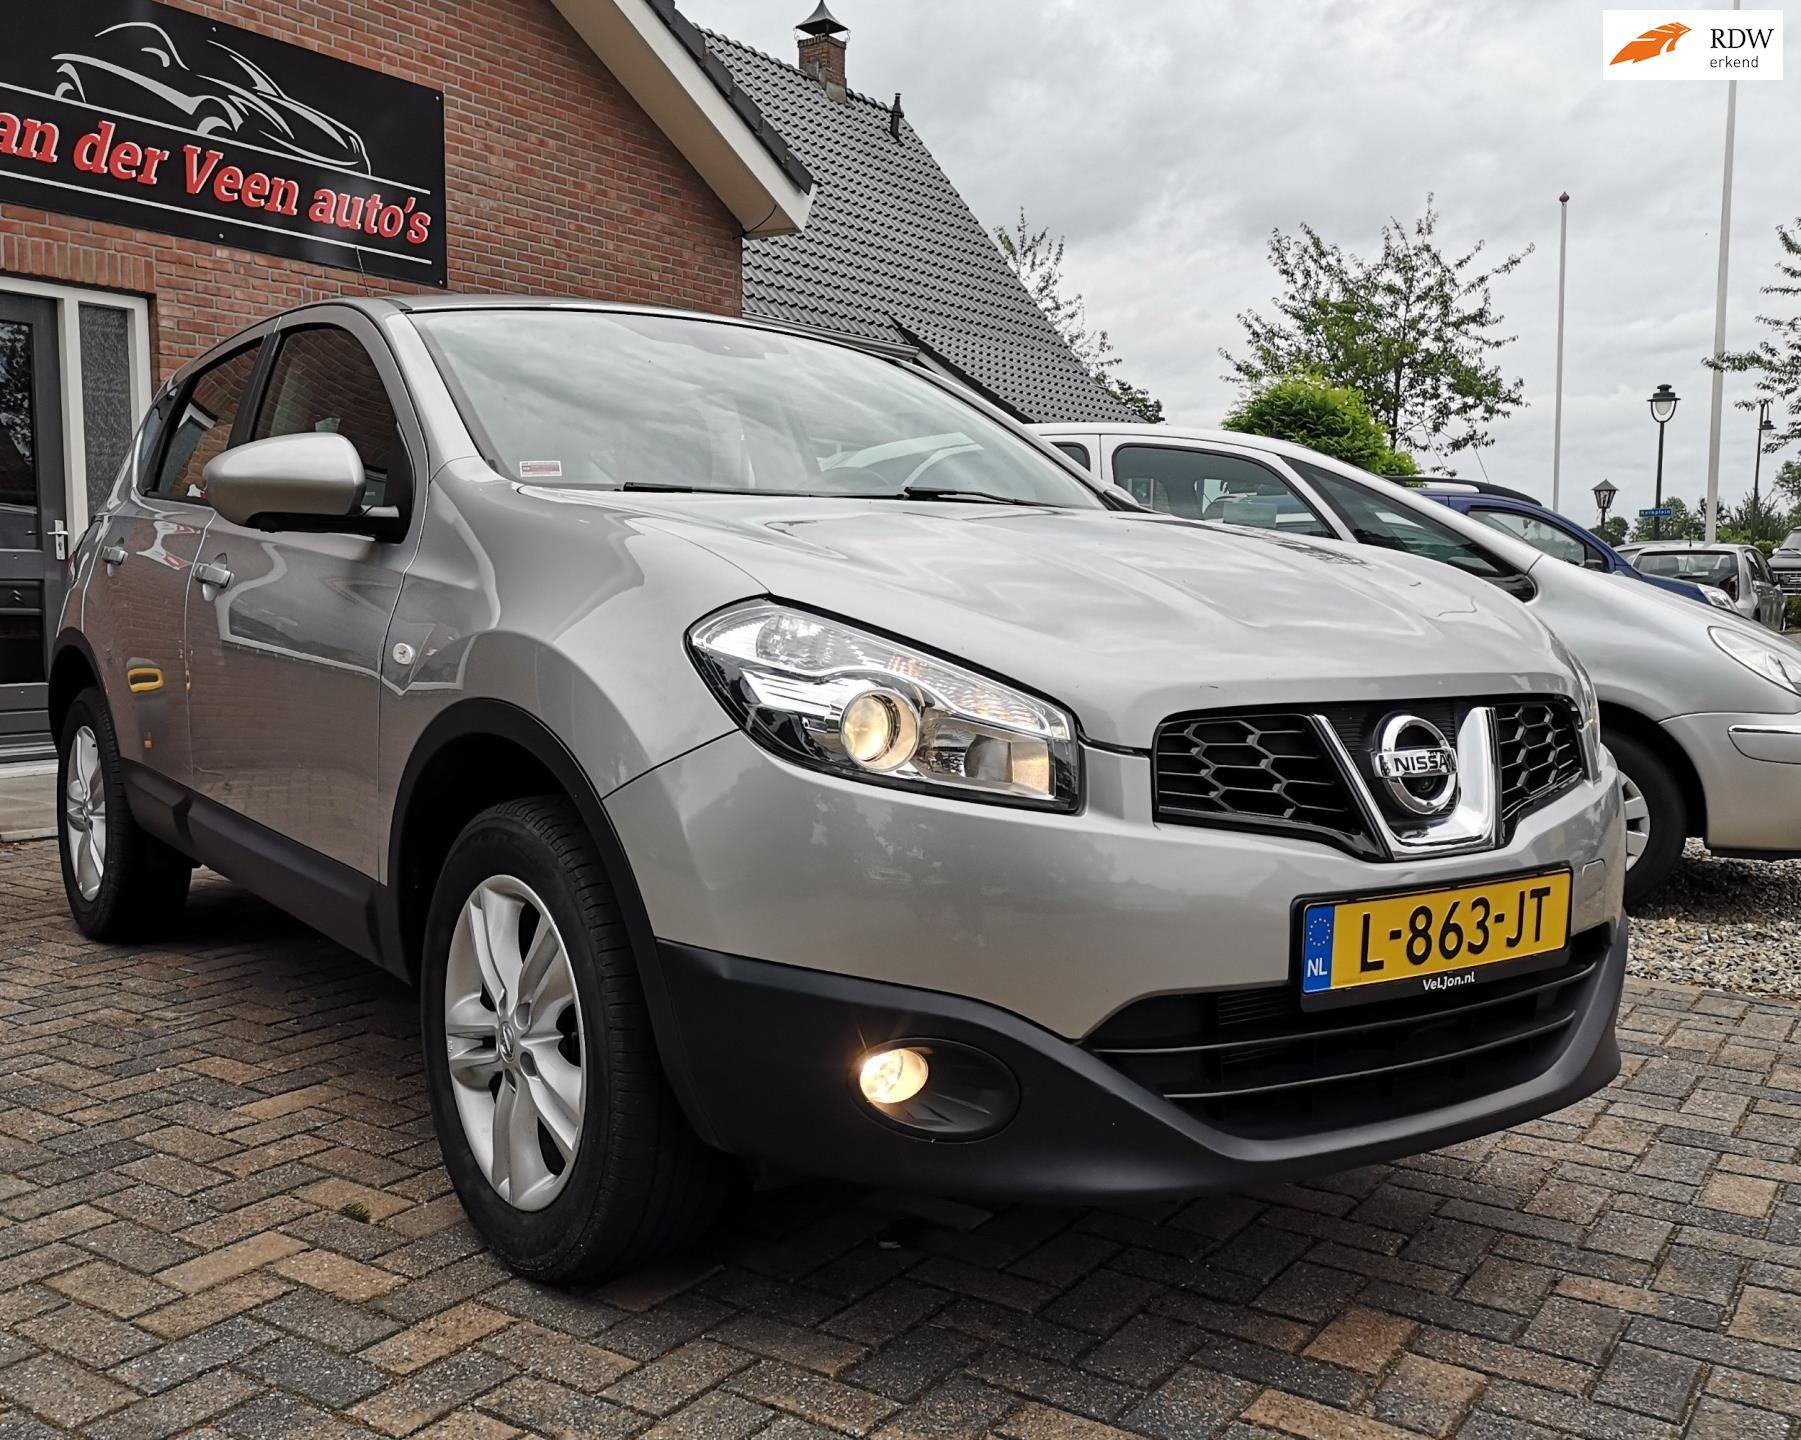 Nissan Qashqai occasion - van der Veen auto's